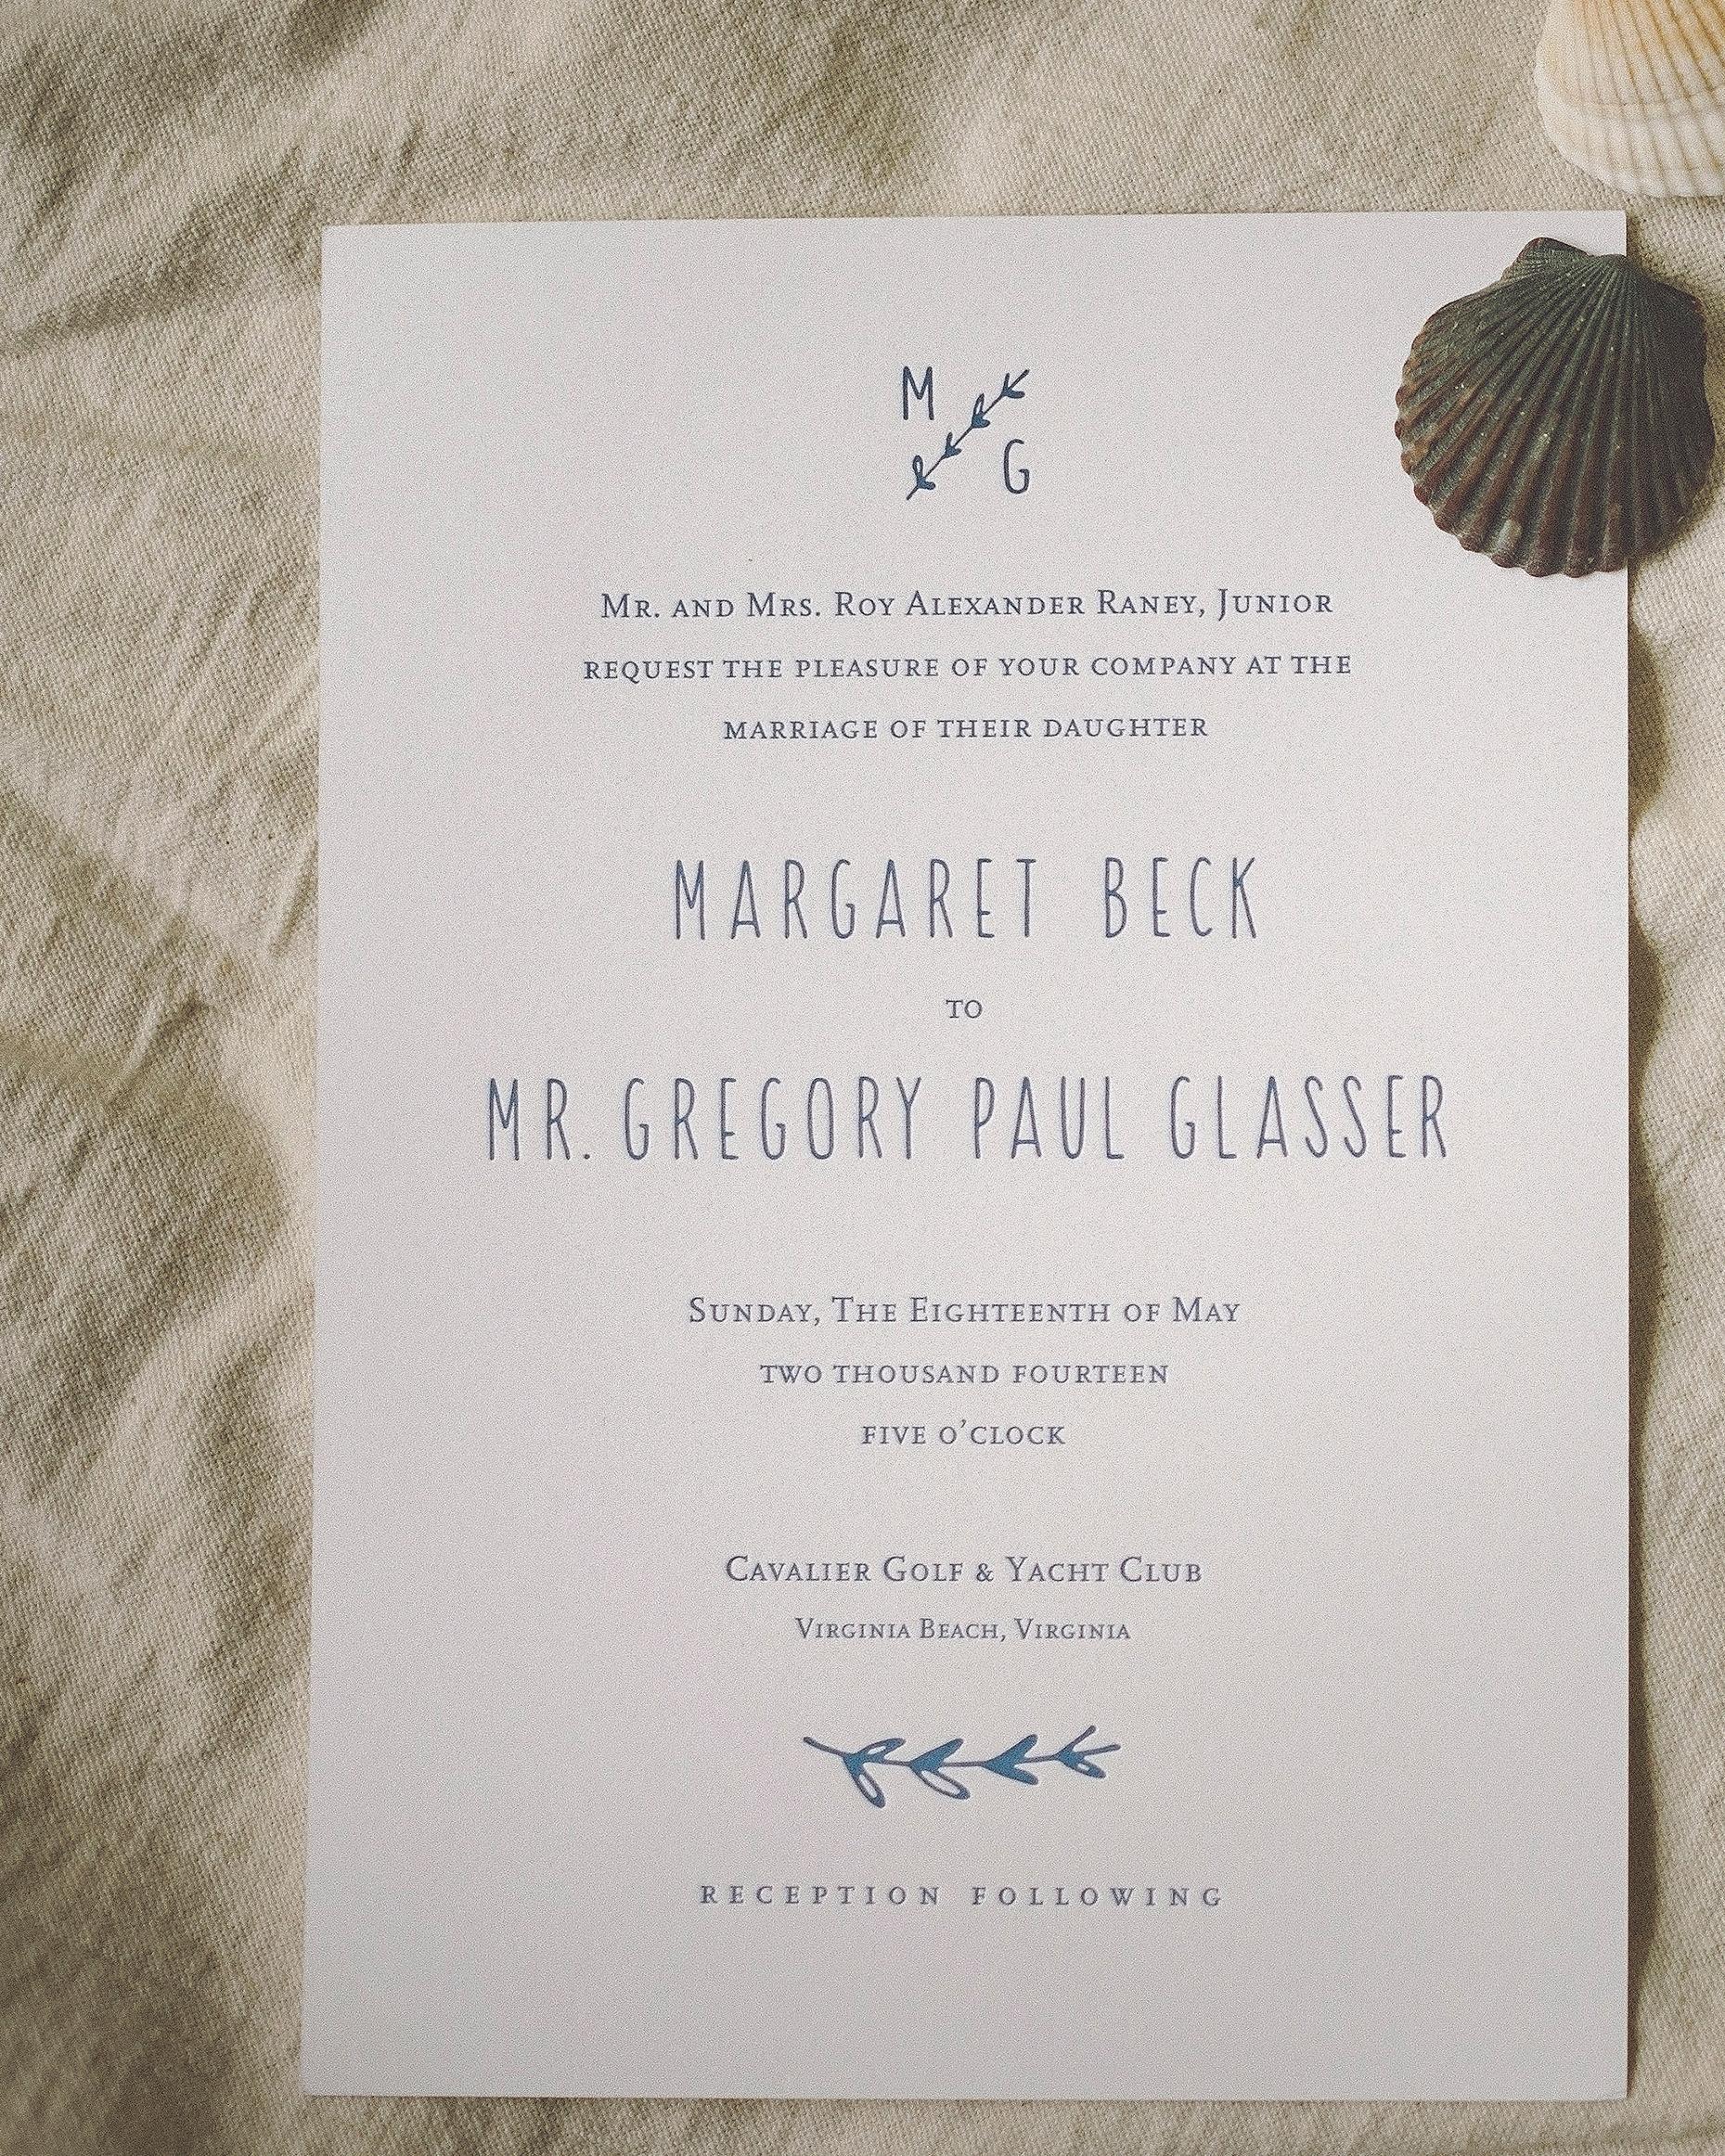 molly-greg-wedding-invite-00000-s111481-0814.jpg